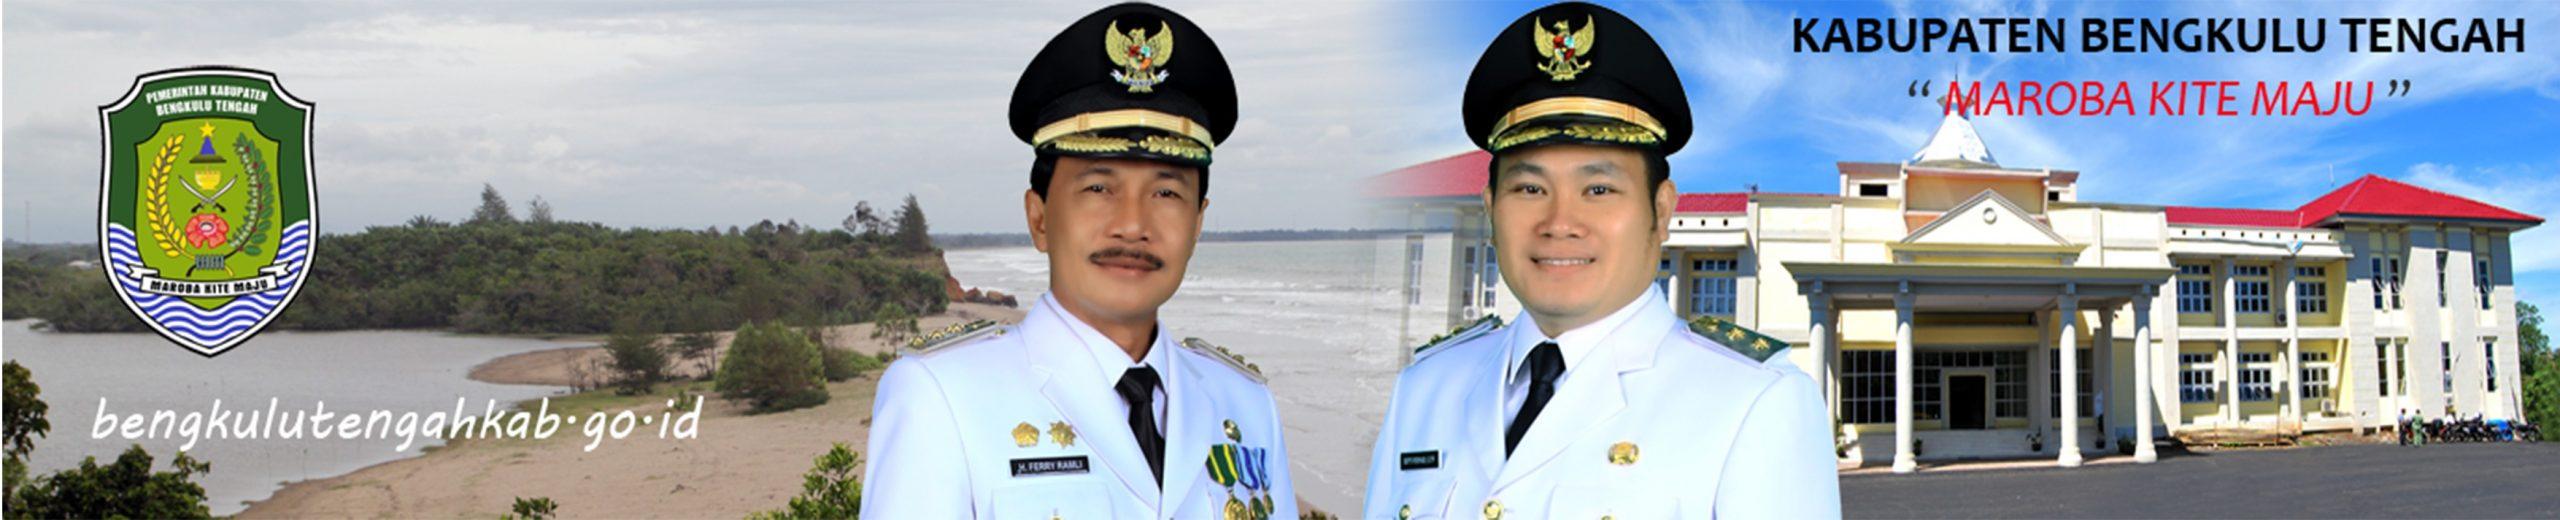 Photo of Bupati Bengkulu Tengah Terus Melakukan Peningkatan Jalan